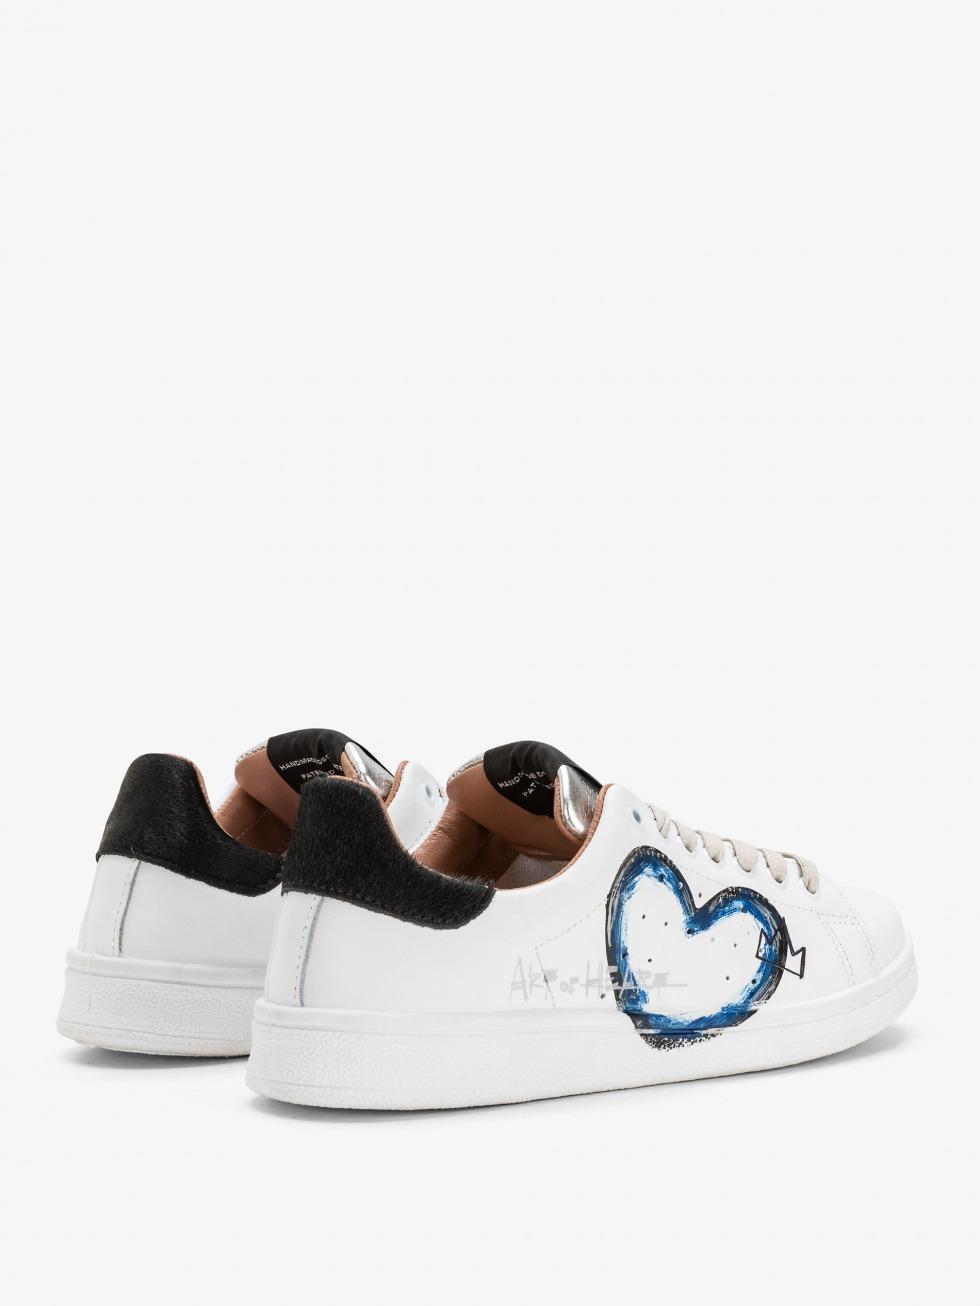 Sneakers Daiquiri - Black Art of Heart Blue